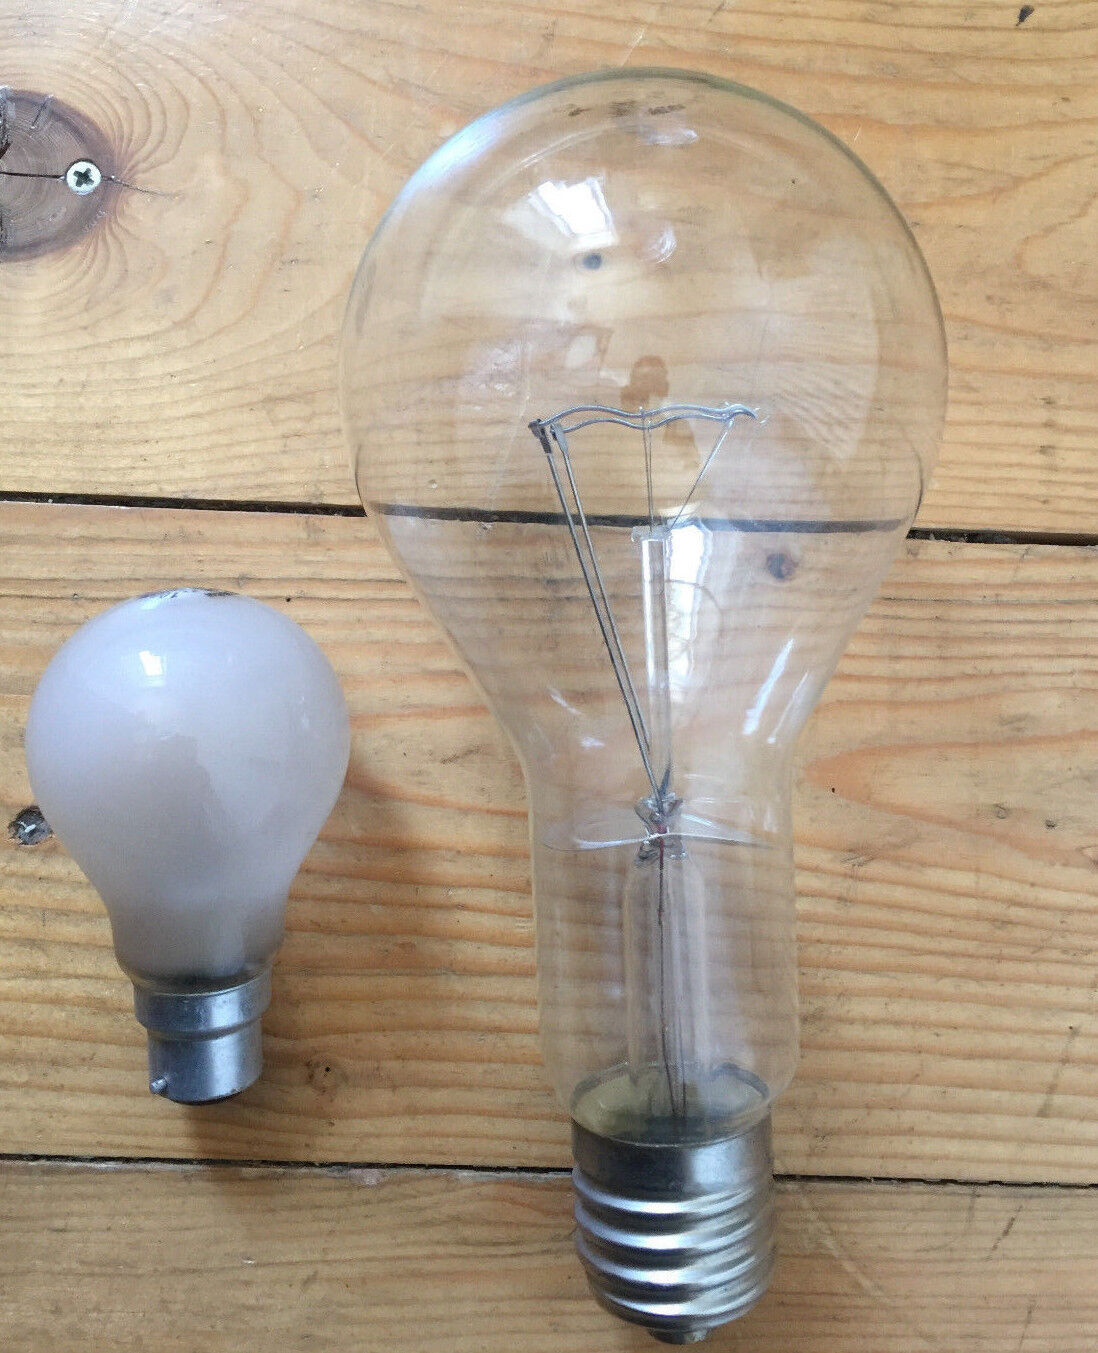 Huge 500 Watt ES Lamp for Stage Amdram Amatuers Dramatics Theatre Edison Screw